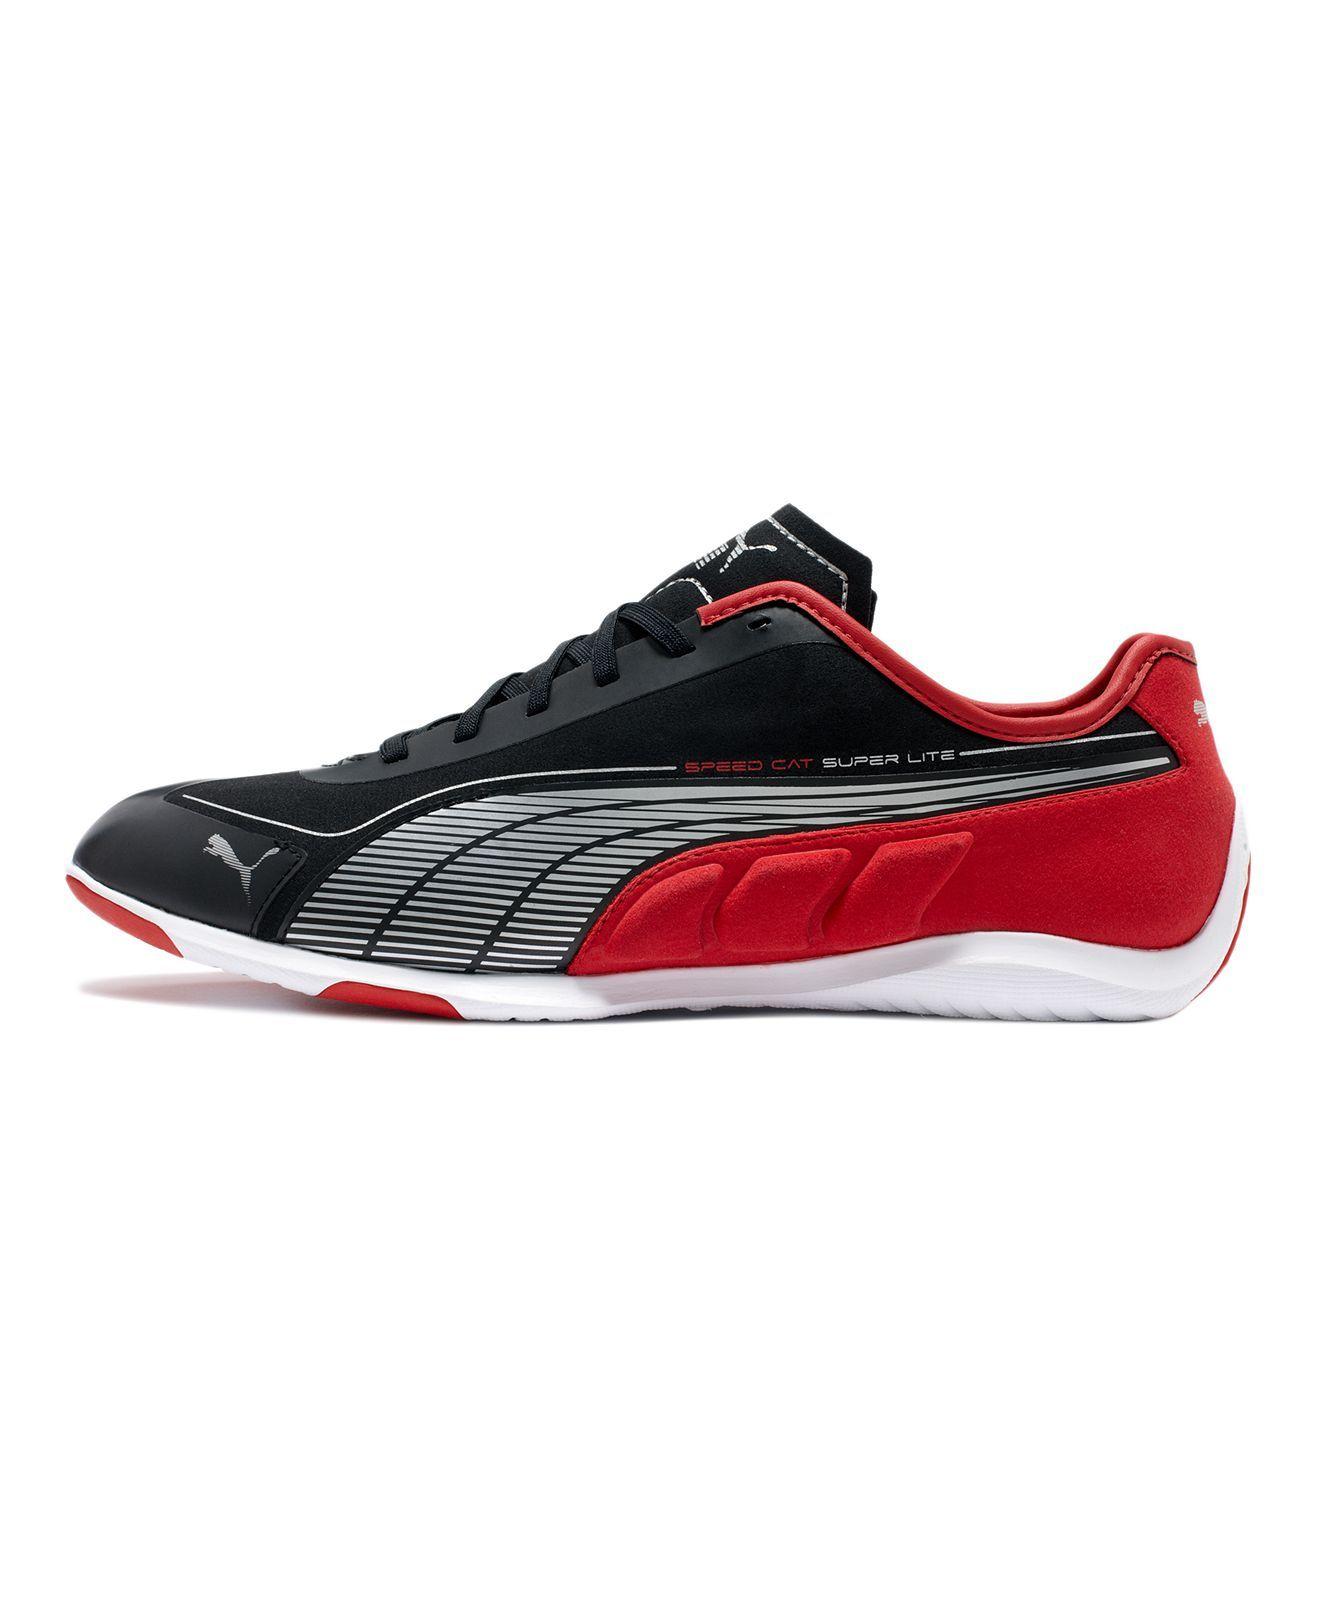 Prestigioso Paciencia Violar  Puma Shoes, Speed Cat SuperLT Low Sneakers & Reviews - All Men's Shoes -  Men - Macy's | Pumas shoes, Sneakers, Low sneakers